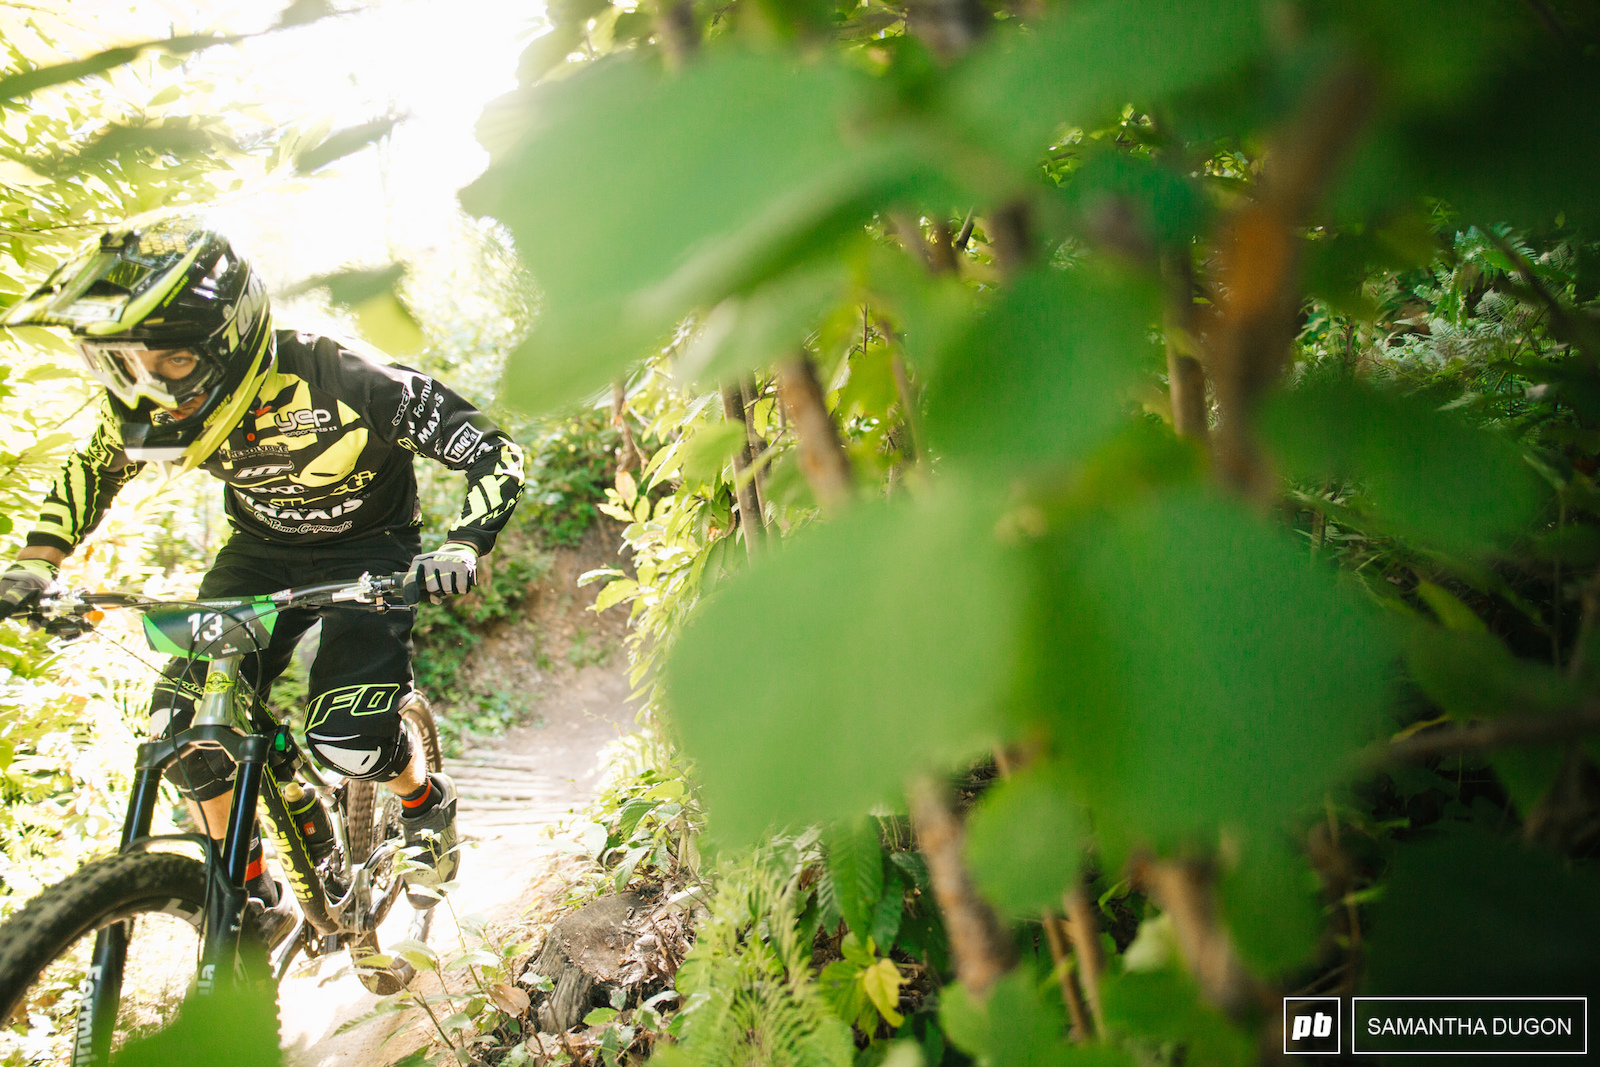 Ancillotti rider Simone Pelissero keeping focused on his way down stage 2.